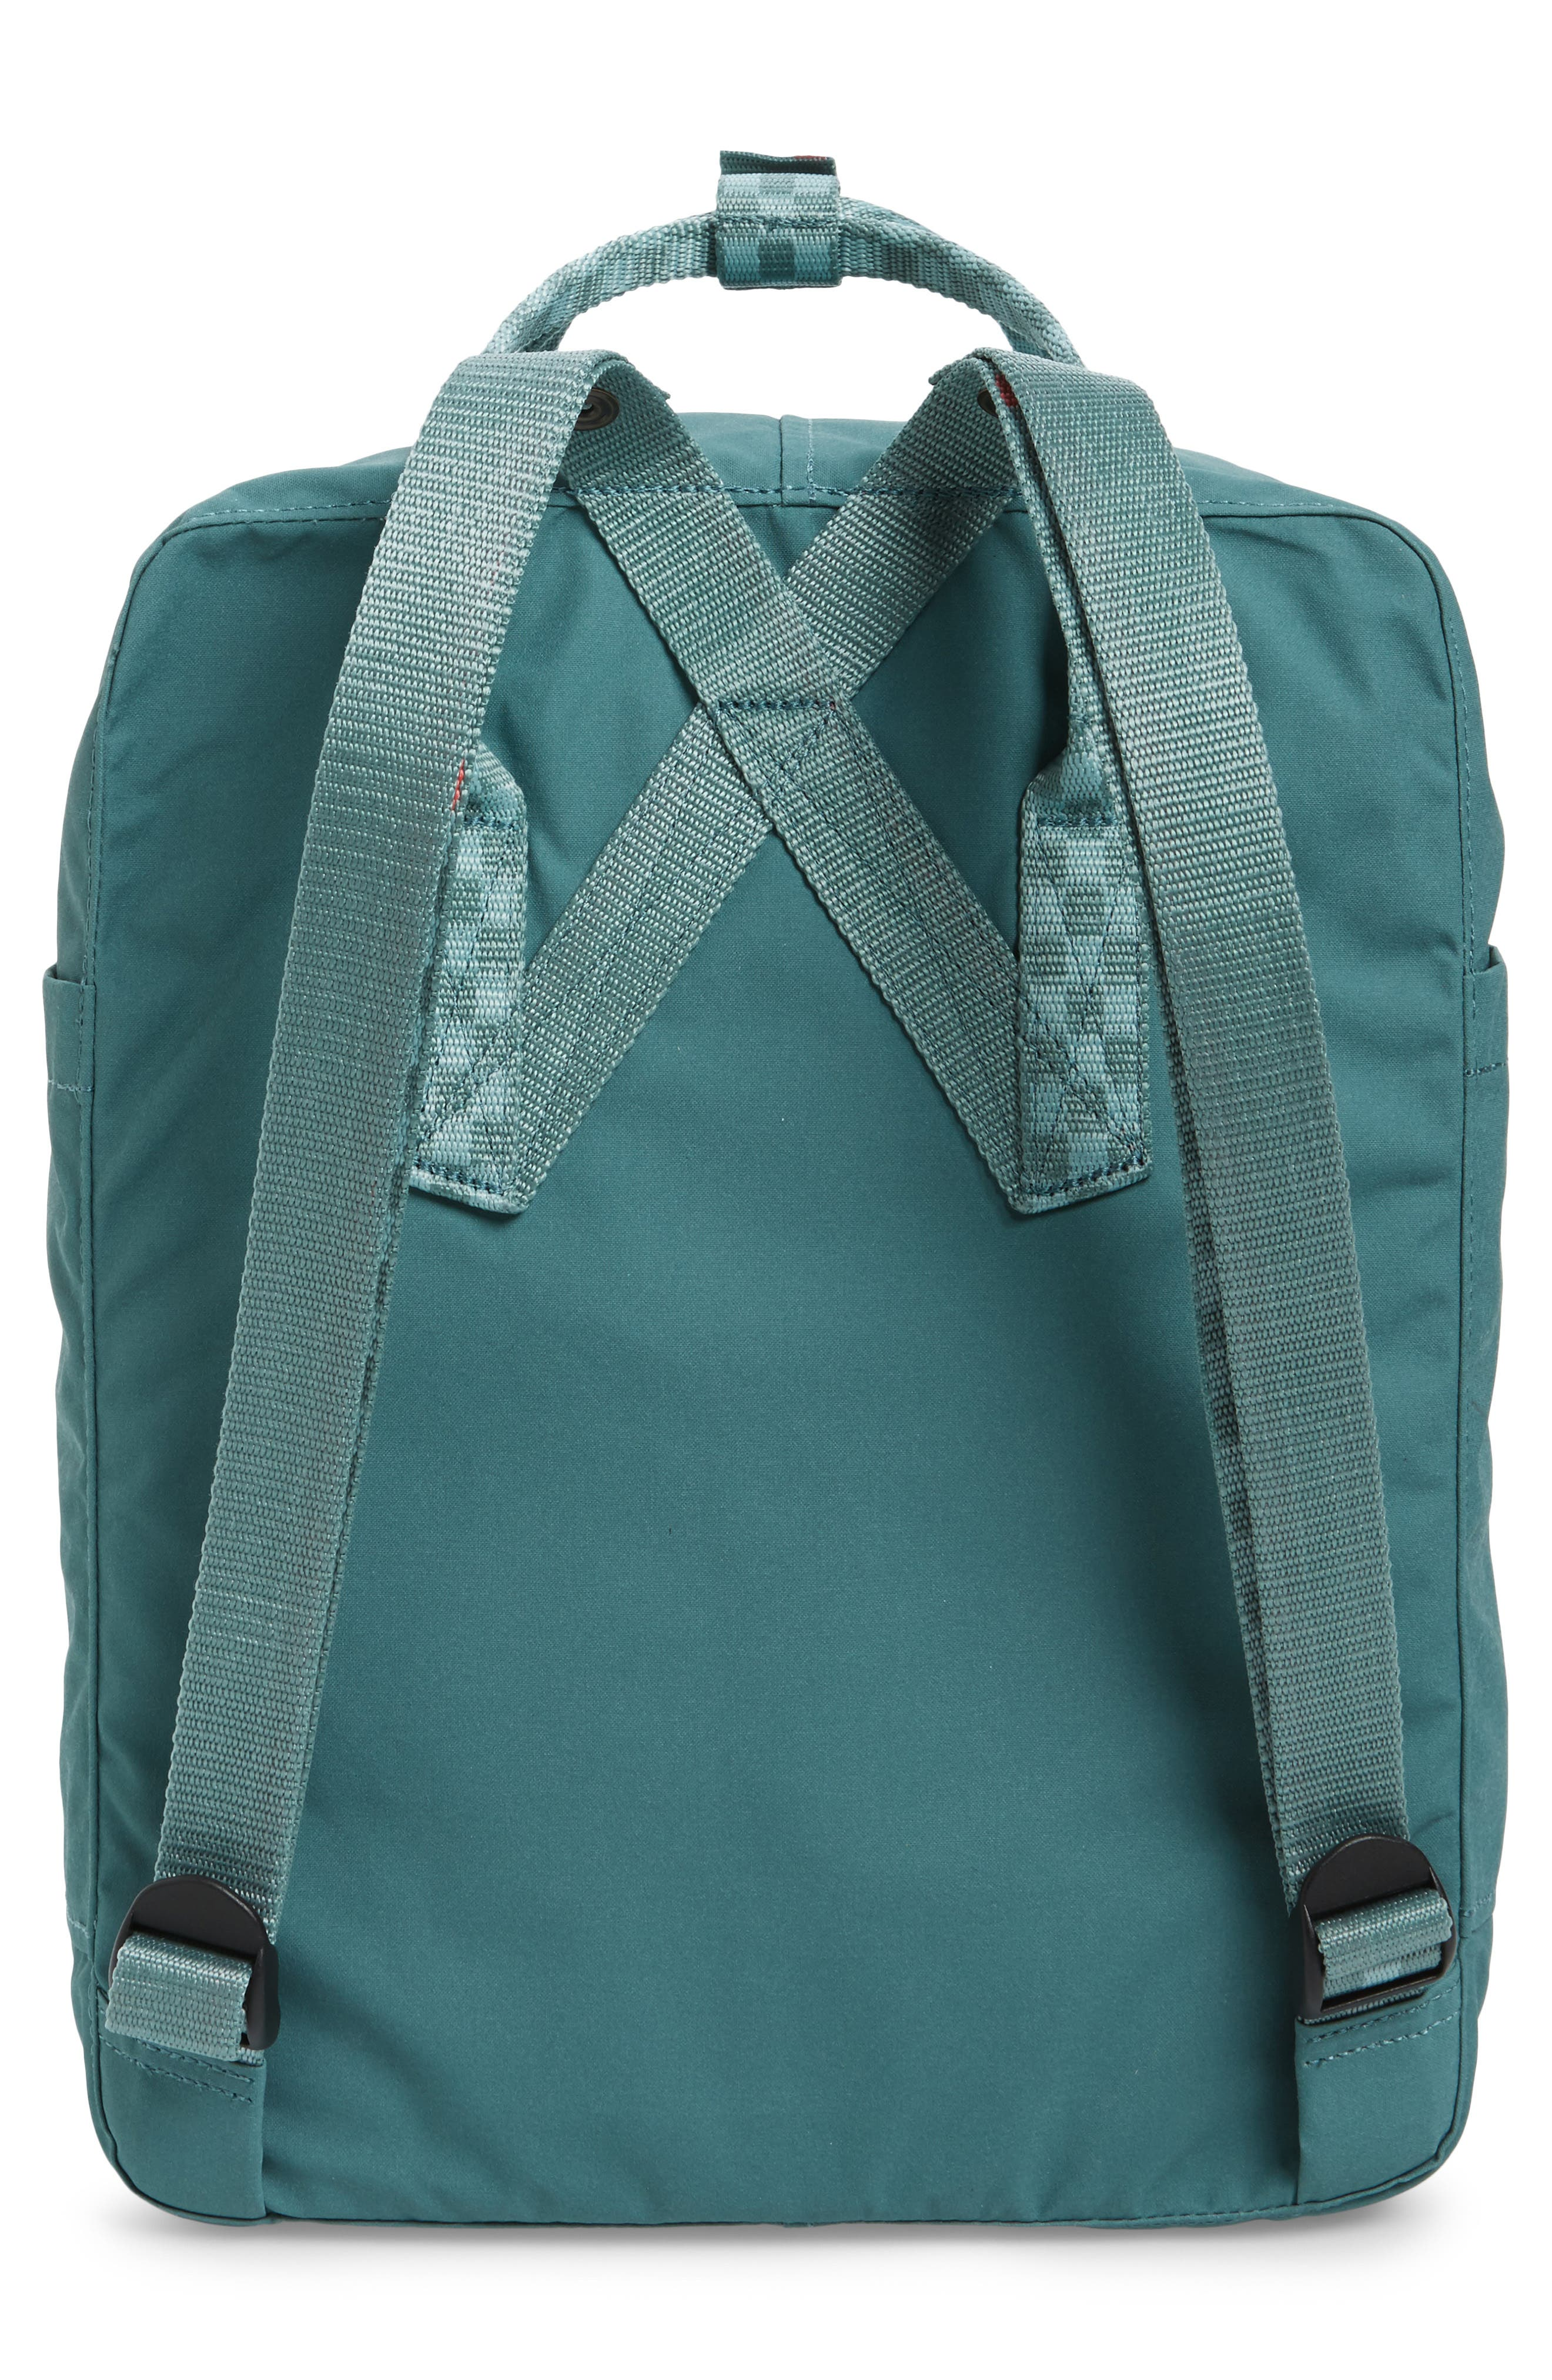 'Kånken' Water Resistant Backpack,                             Alternate thumbnail 143, color,